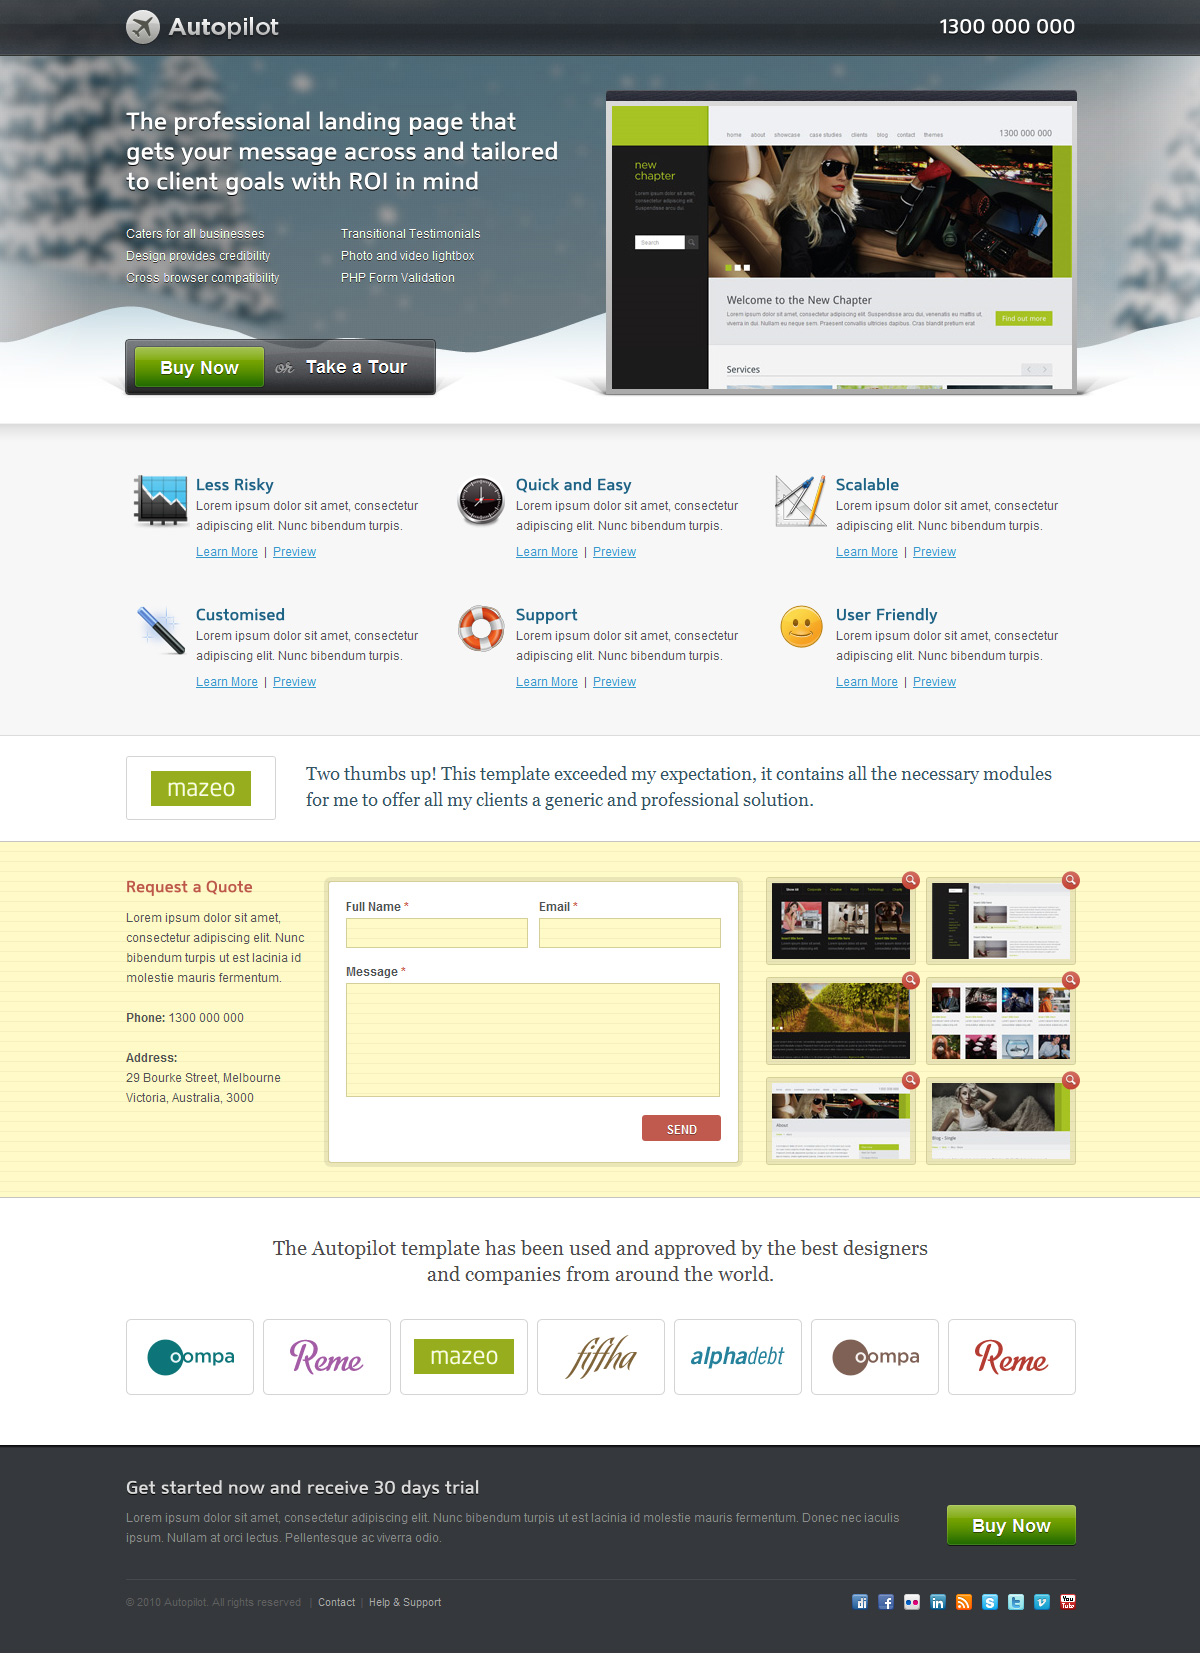 Autopilot Landing Page (3 Themes) - Screenshot 03 - Festive